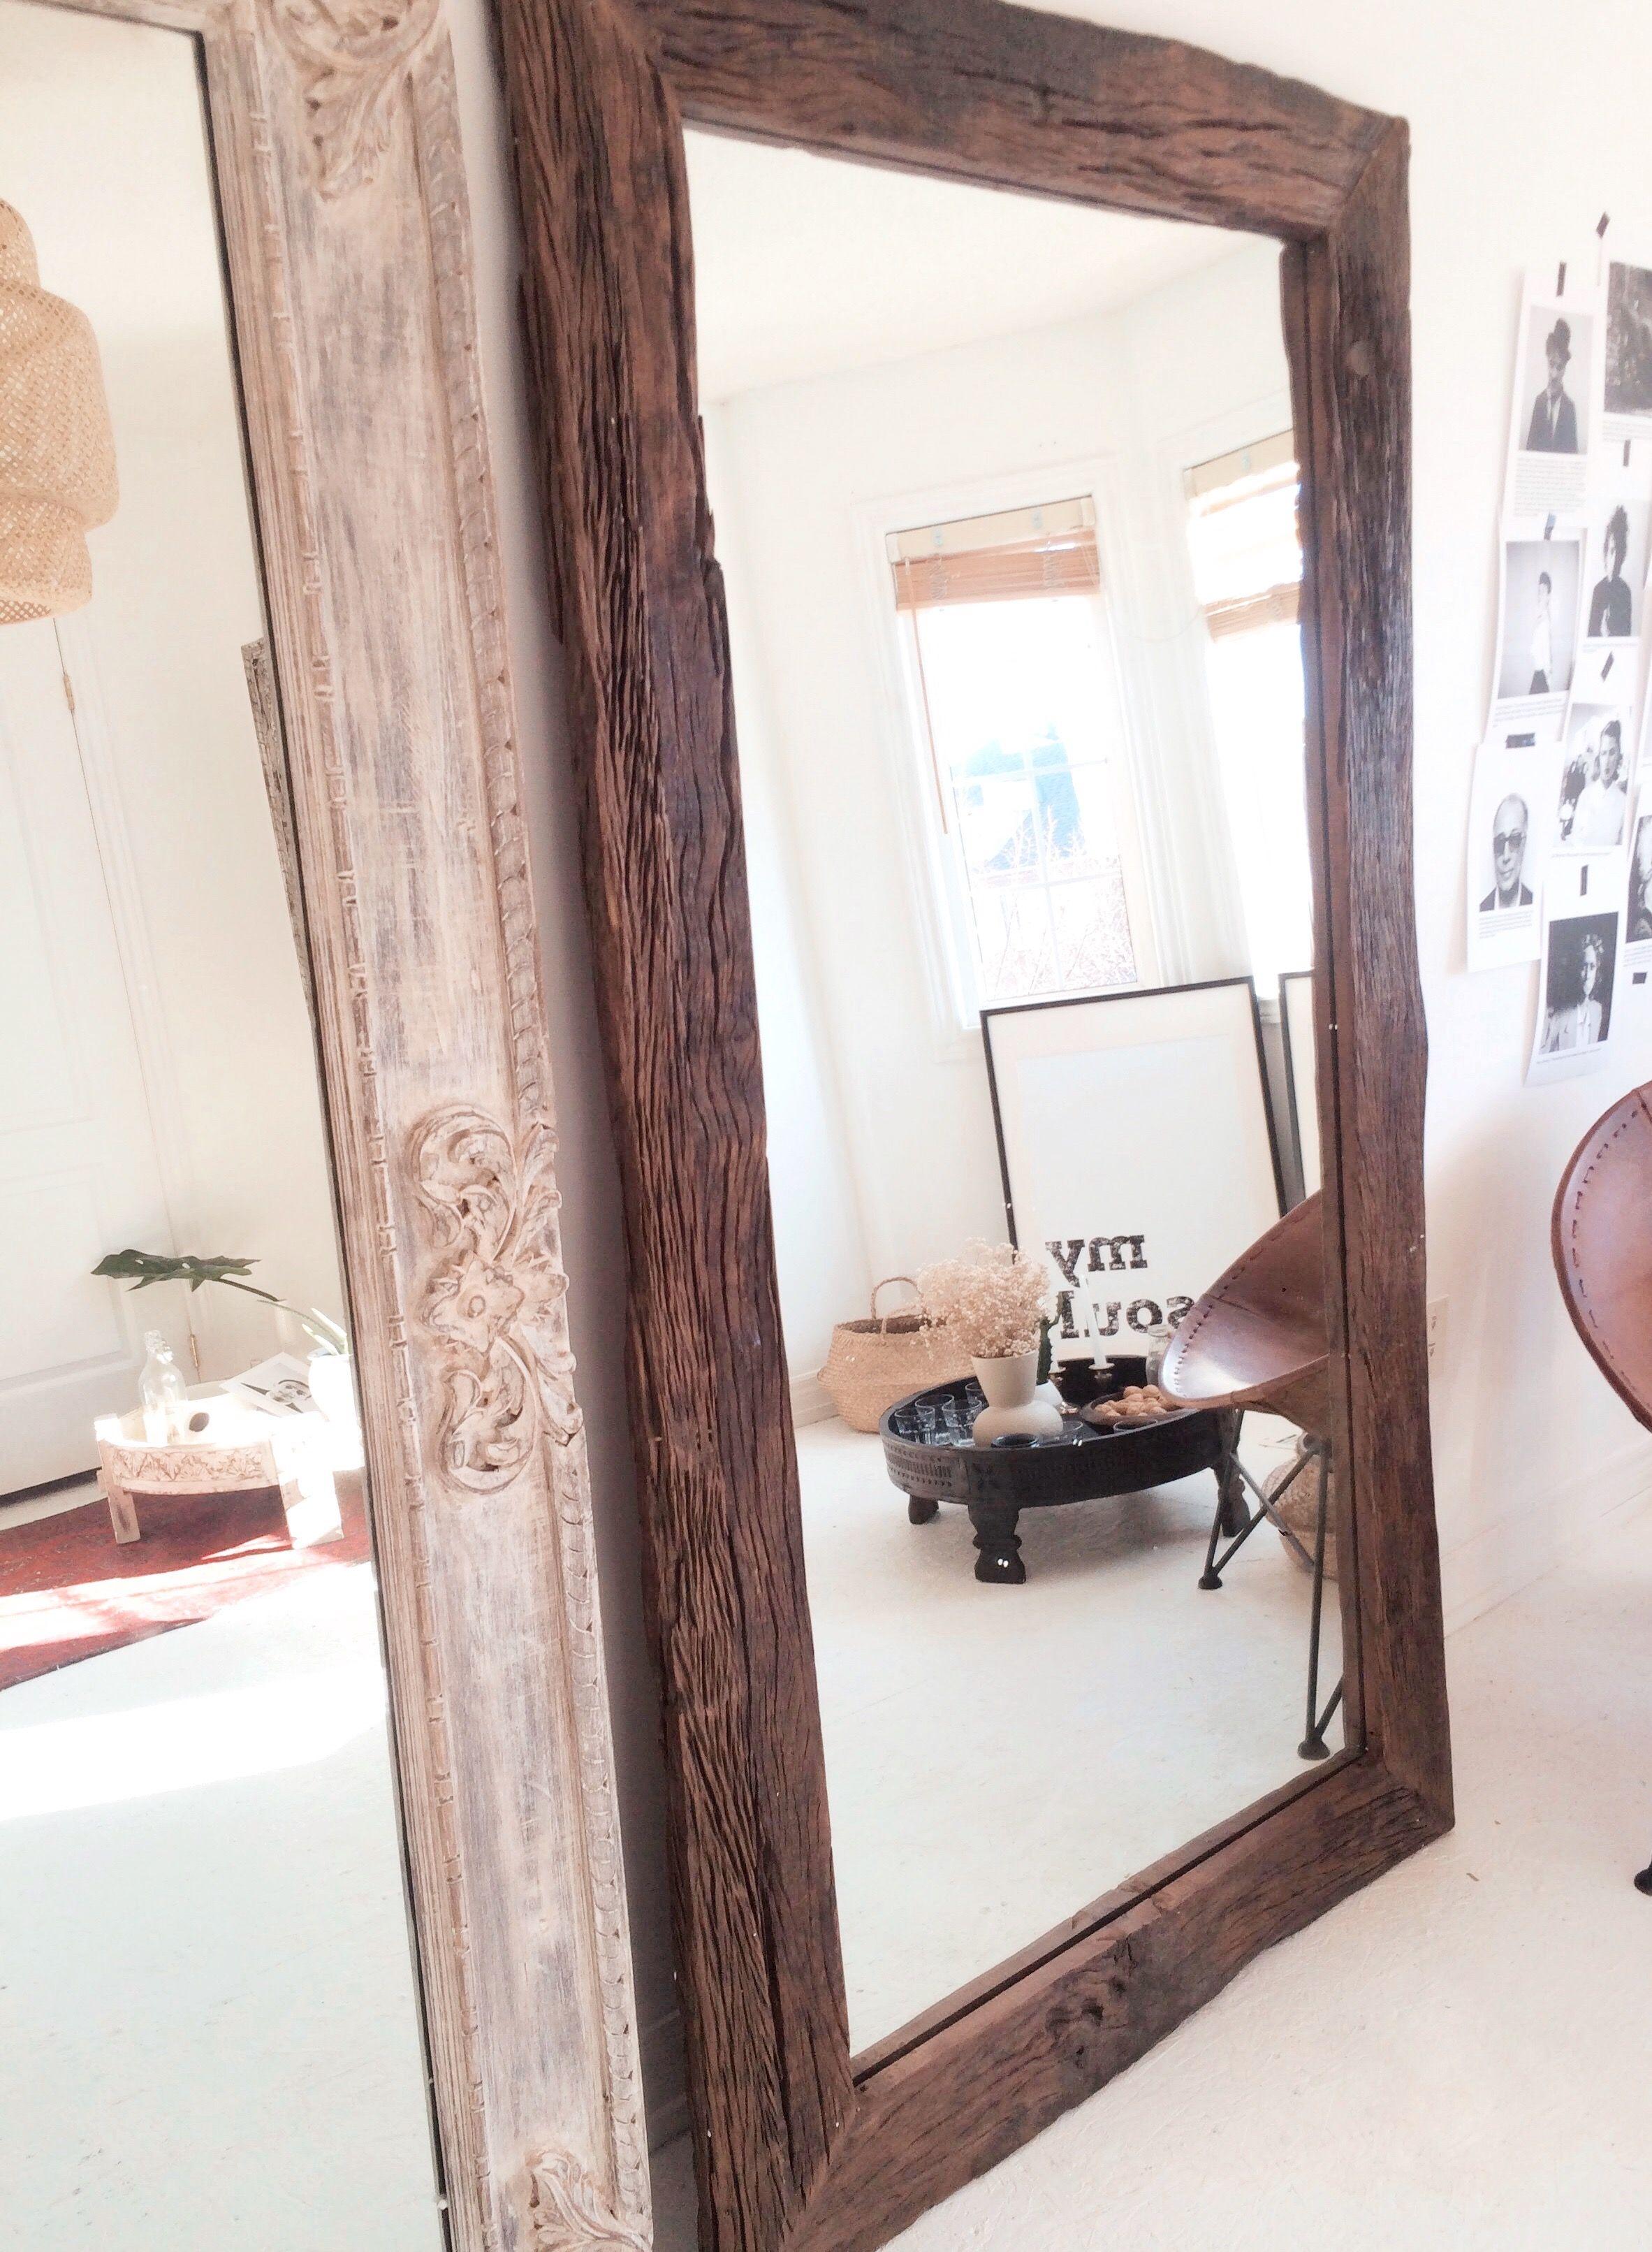 Reclaimed Wood Floor Mirror Extra Large Wood Framed Mirror